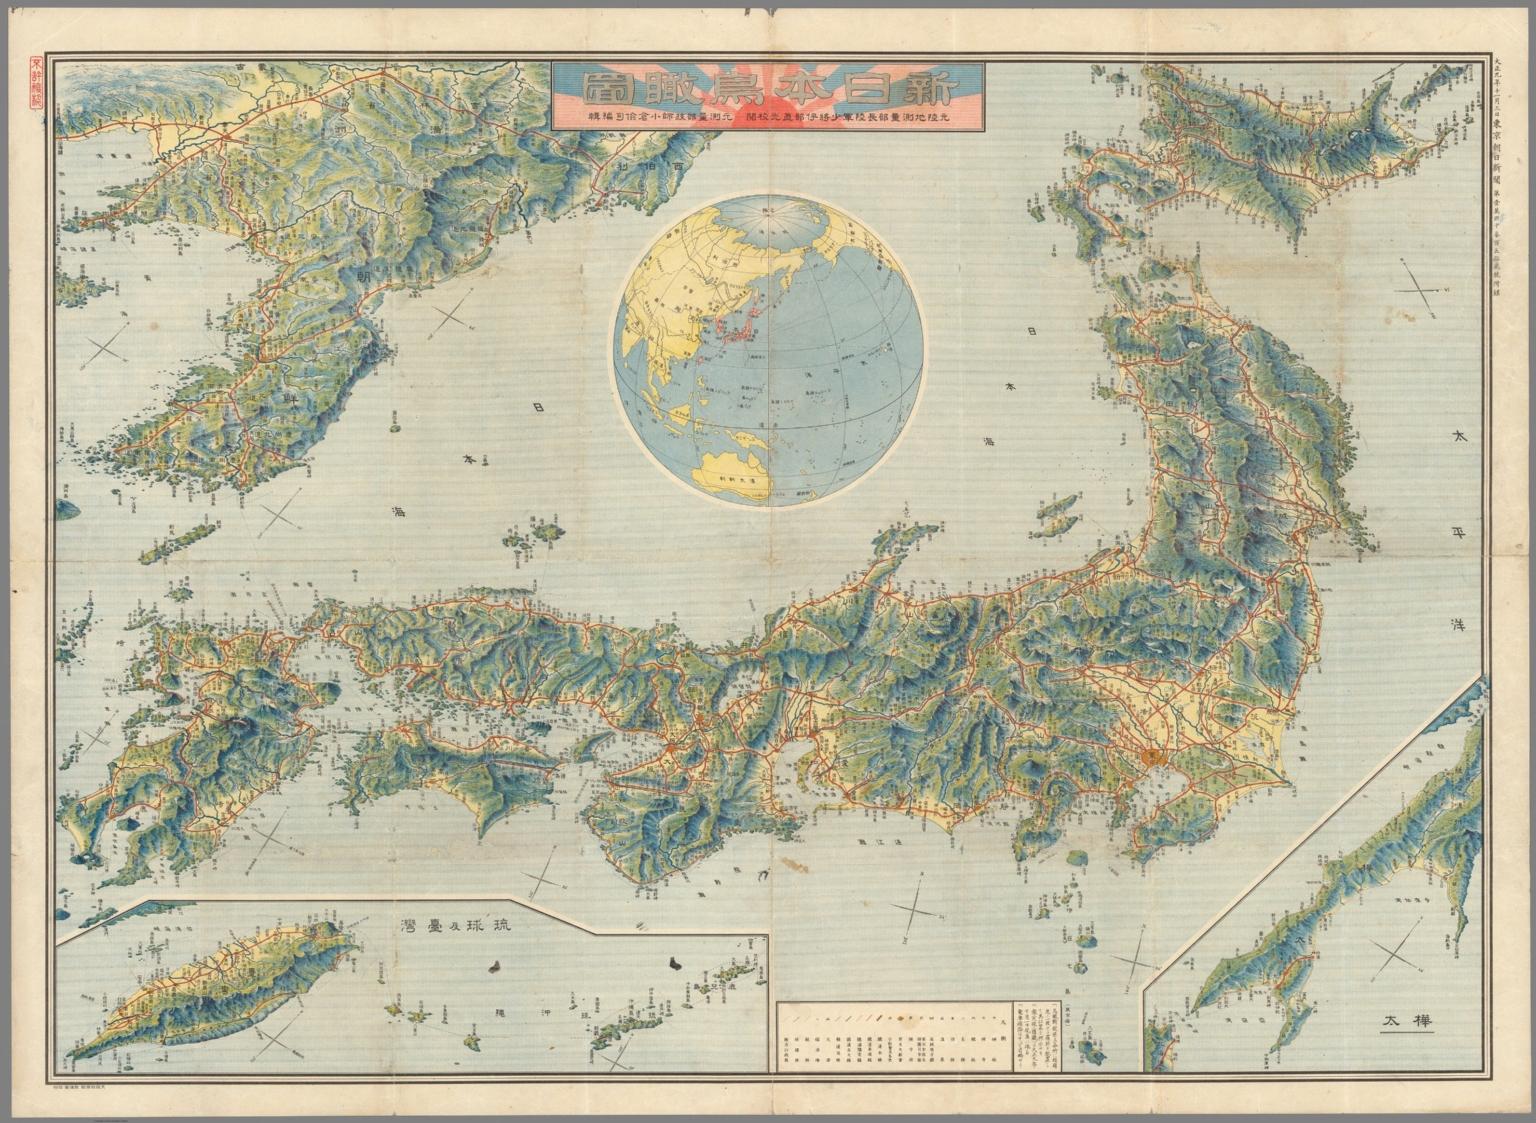 Japan Korea And Taiwan David Rumsey Historical Map Collection